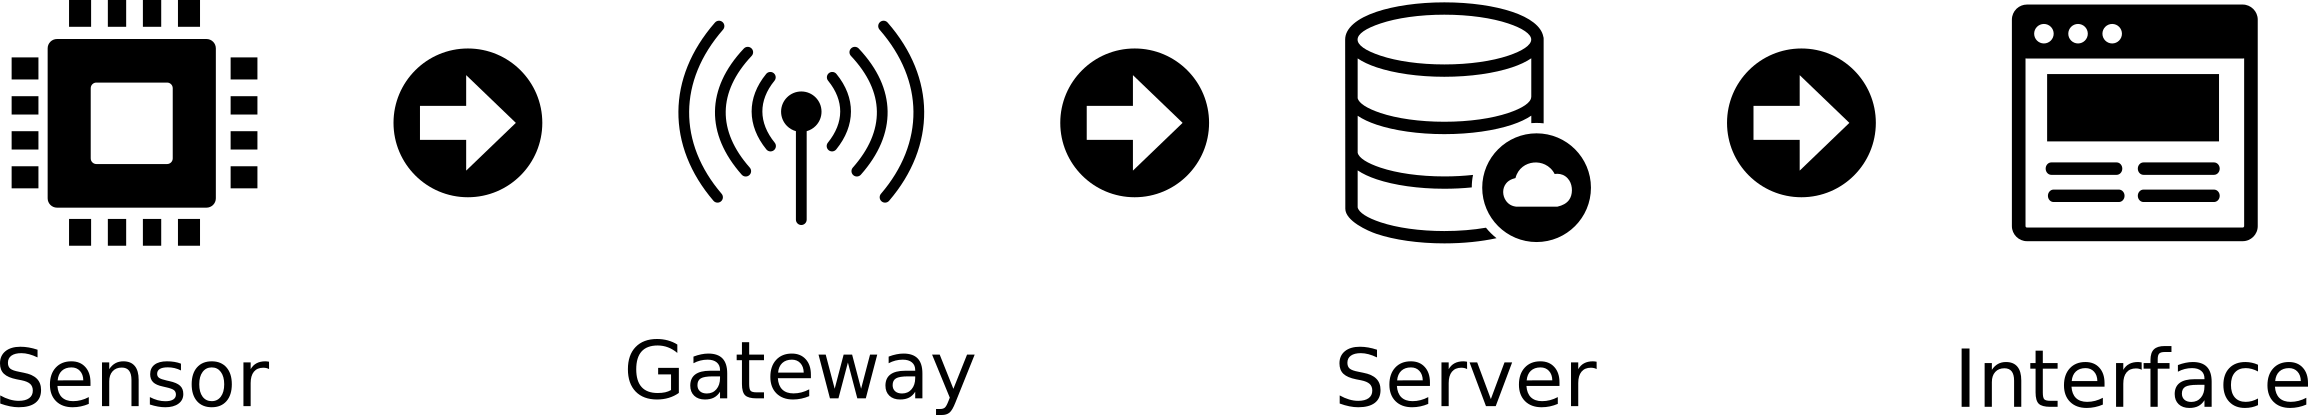 LoRa setup diagram